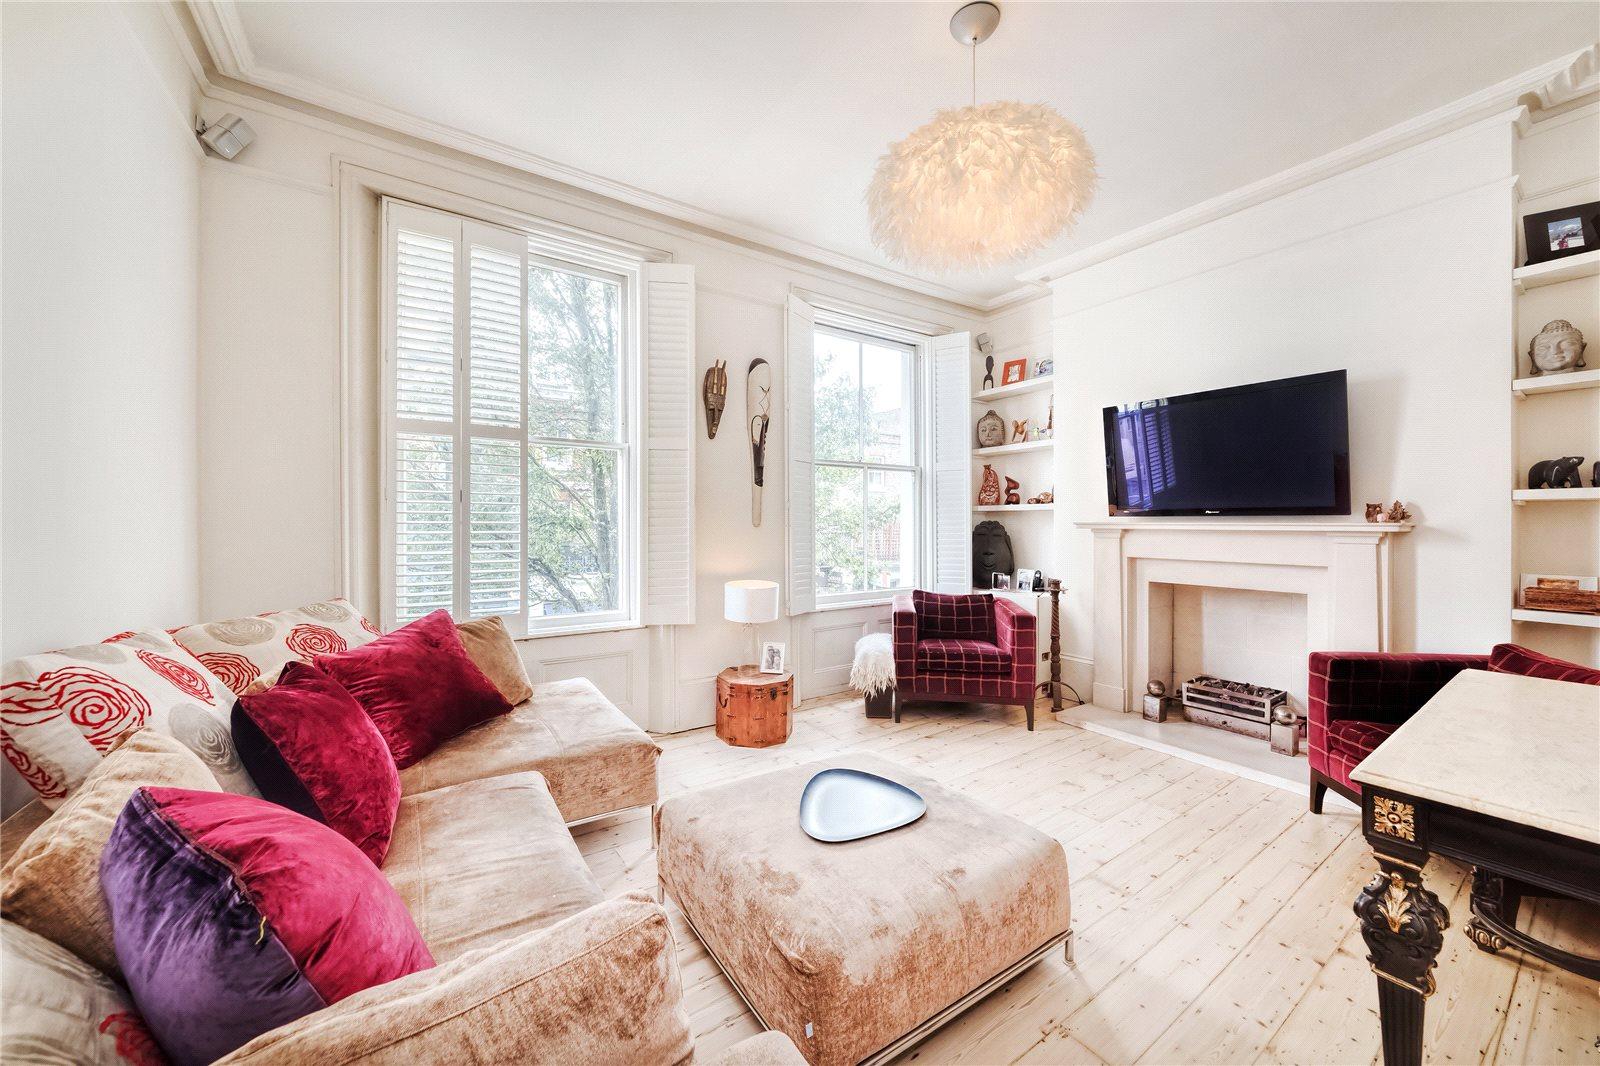 Апартаменты / Квартиры для того Продажа на Park Walk, Chelsea, London, SW10 Chelsea, London, Англия